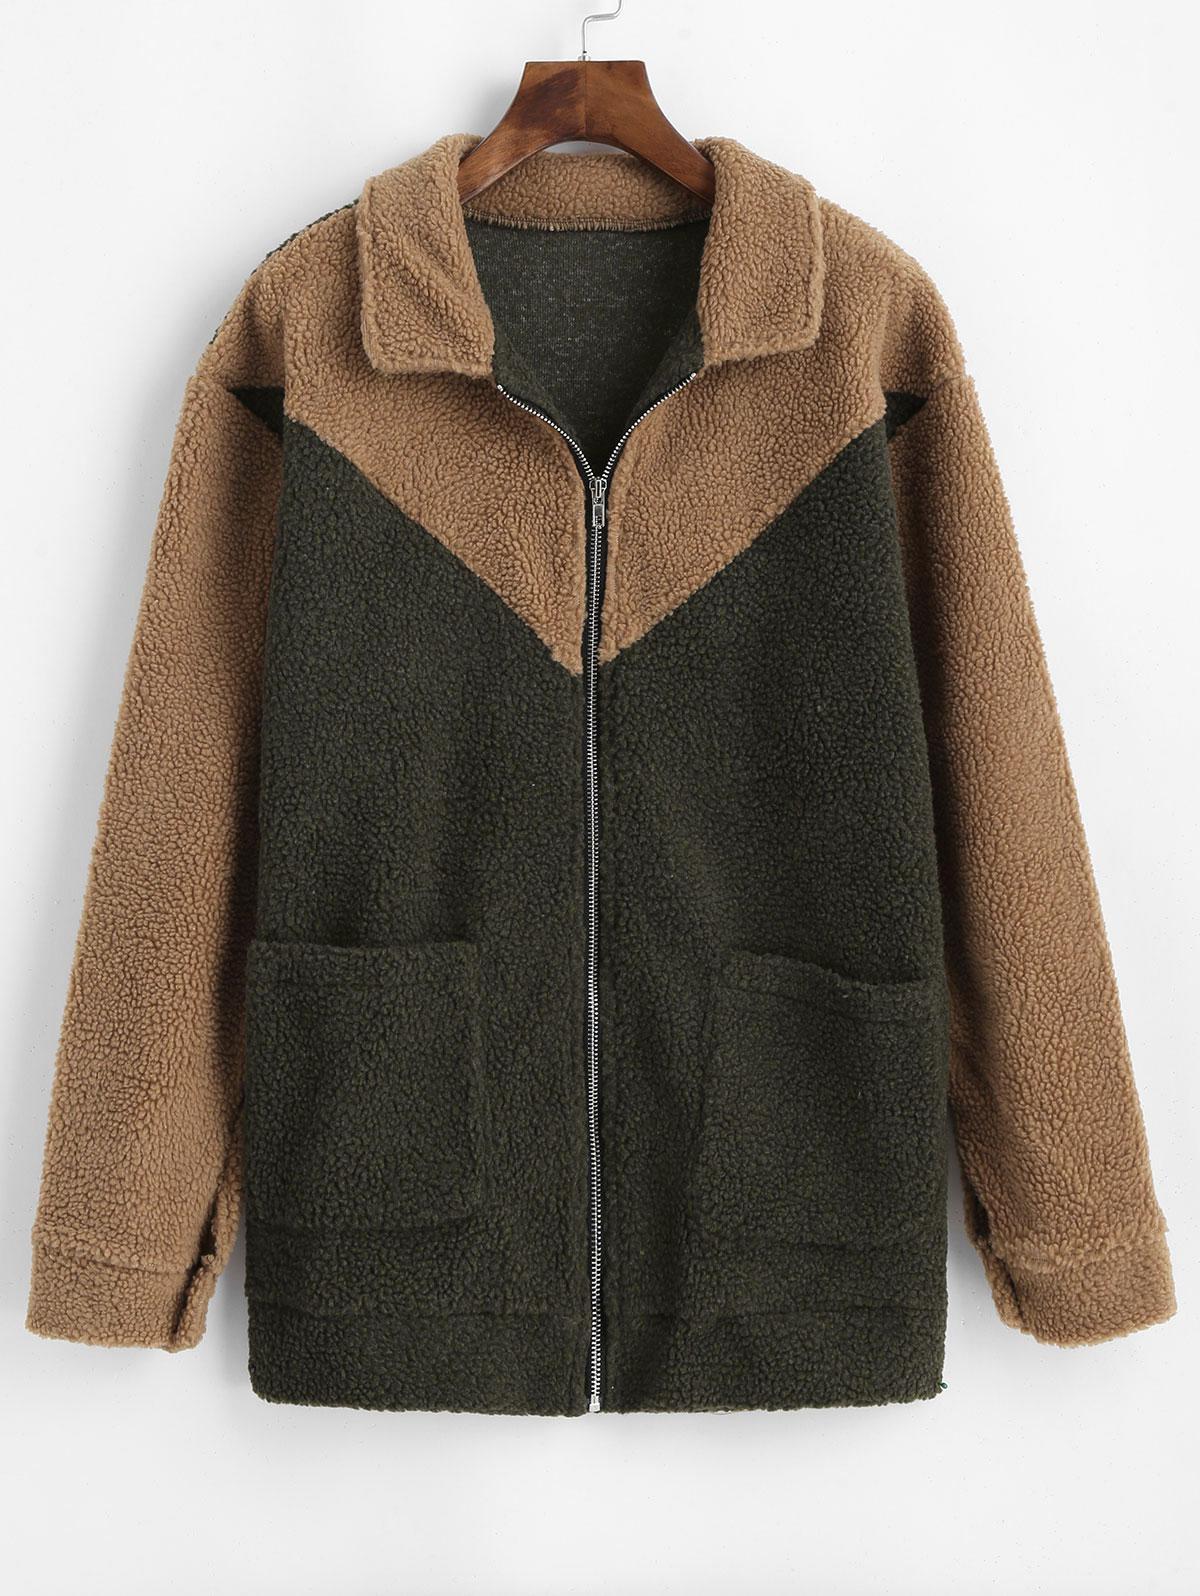 Two Tone Fluffy Pocket Zip Teddy Coat